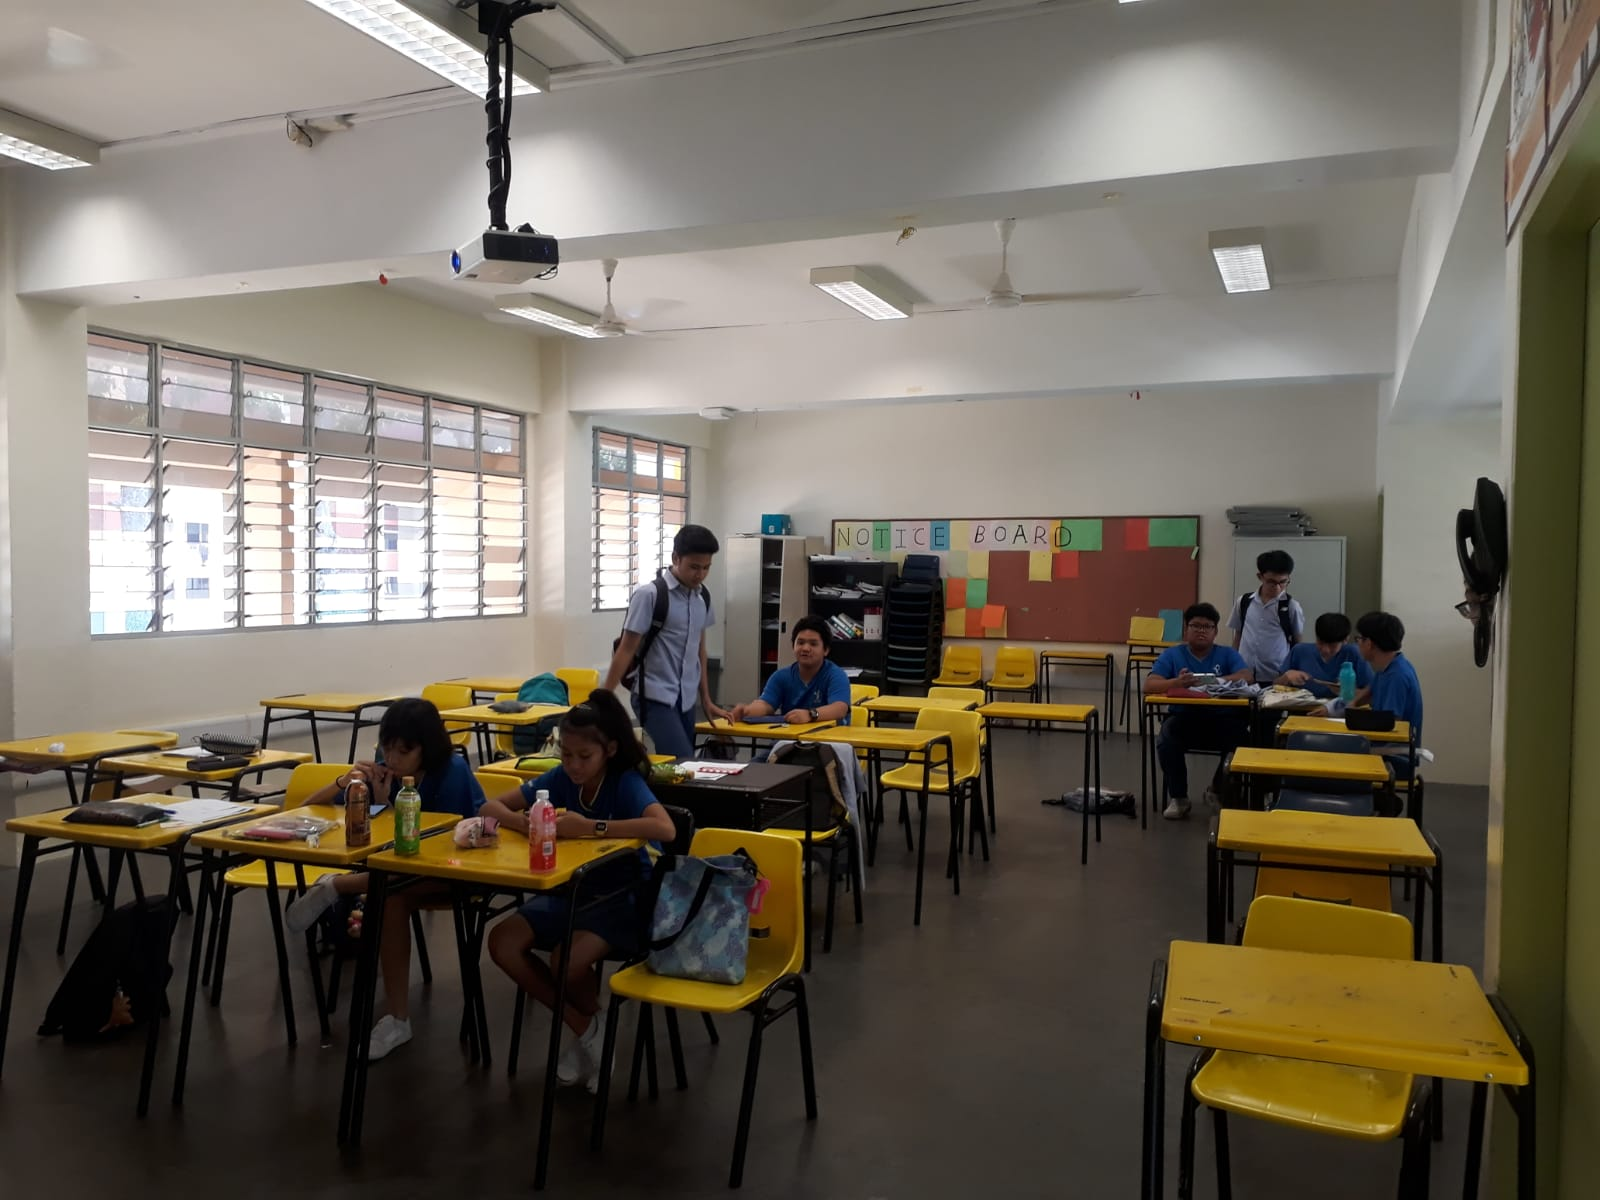 ClassroomProject